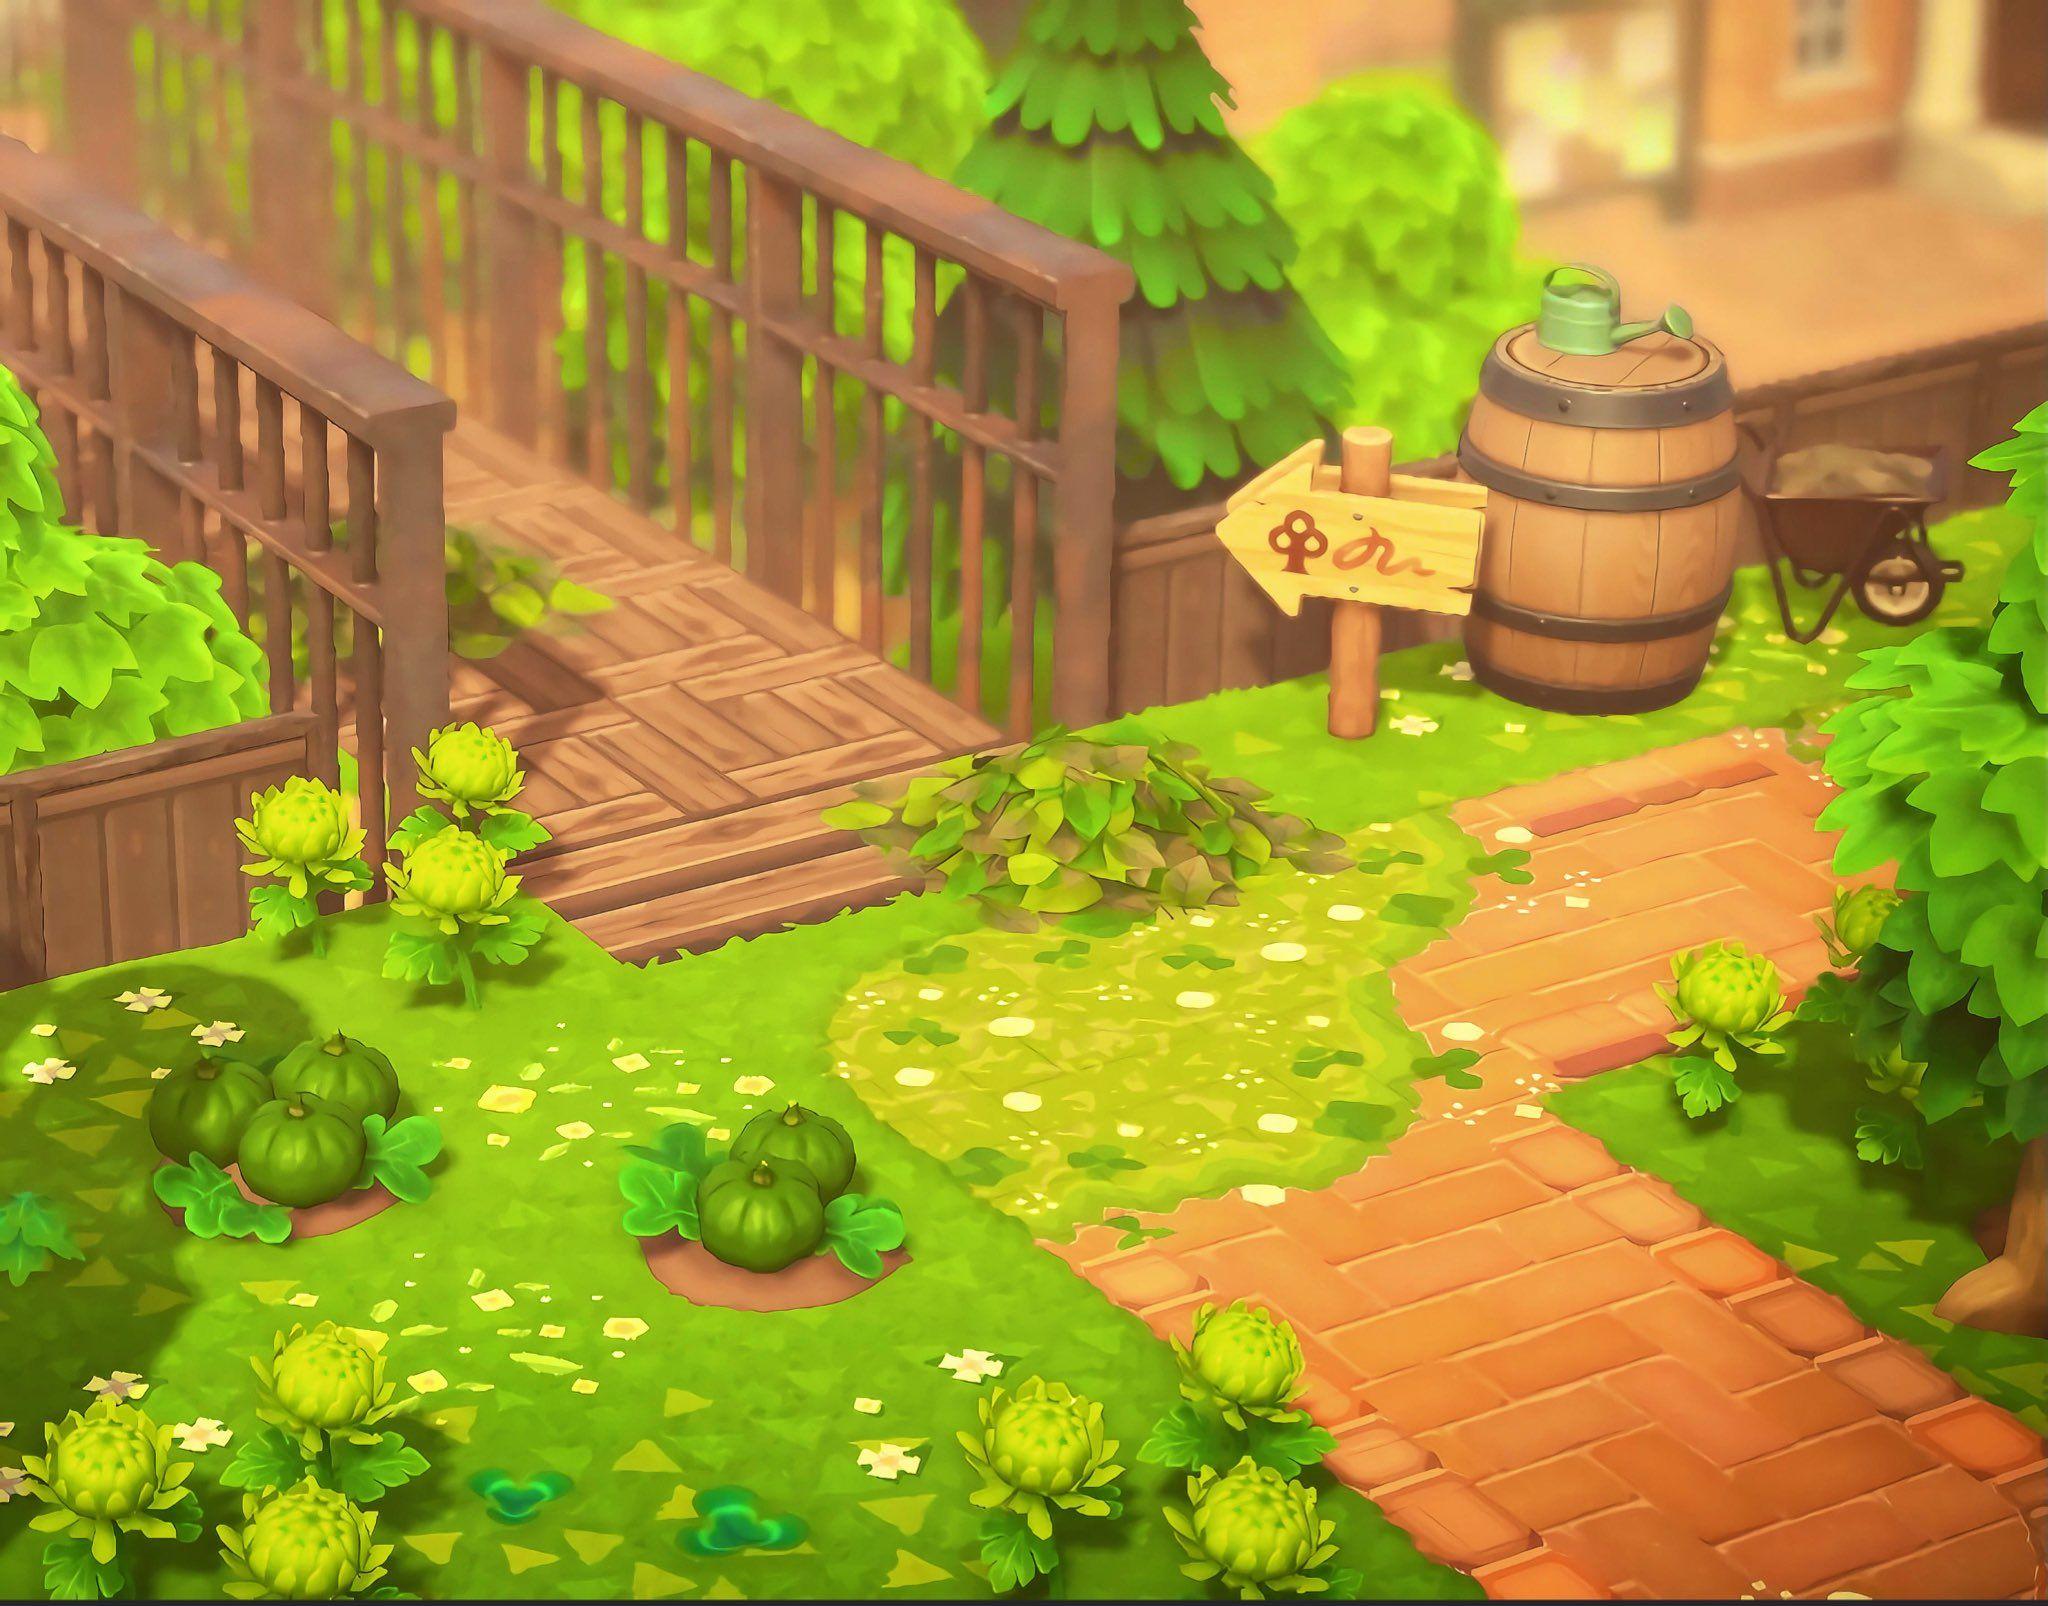 Animal Crossing Inspo 🌺 on Twitter